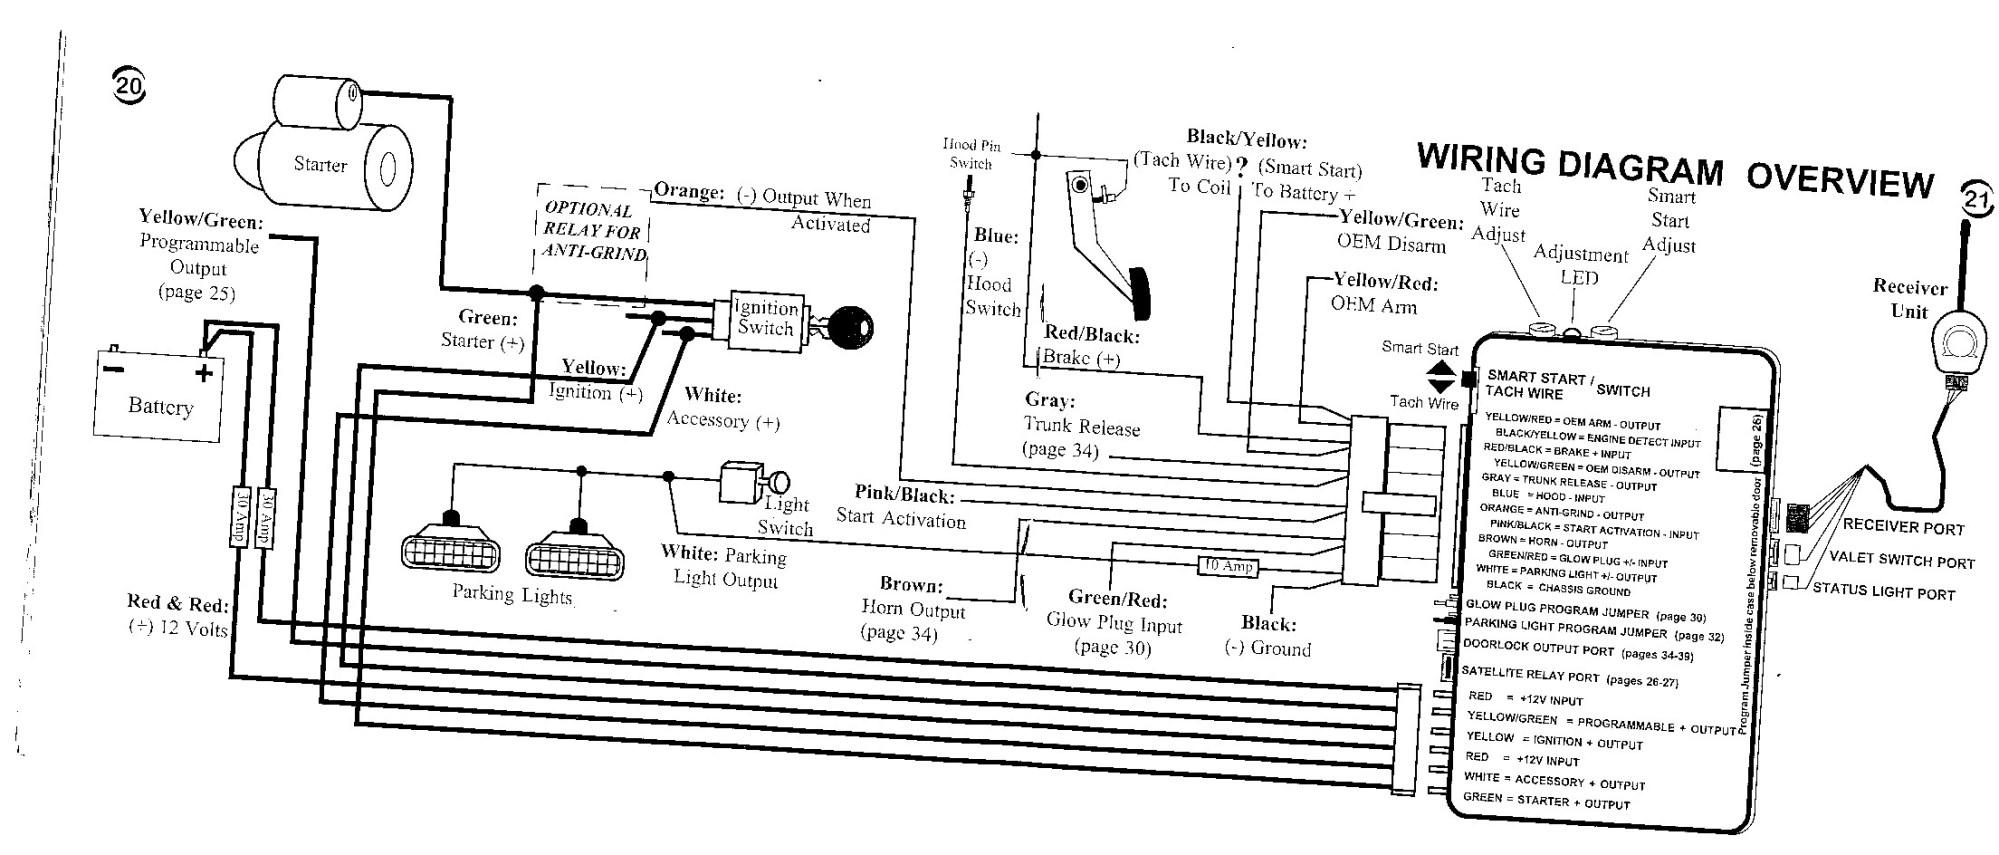 hight resolution of viper 5607v wiring diagram wiring library viper 5701 wiring diagram viper 350hv wiring diagram starting